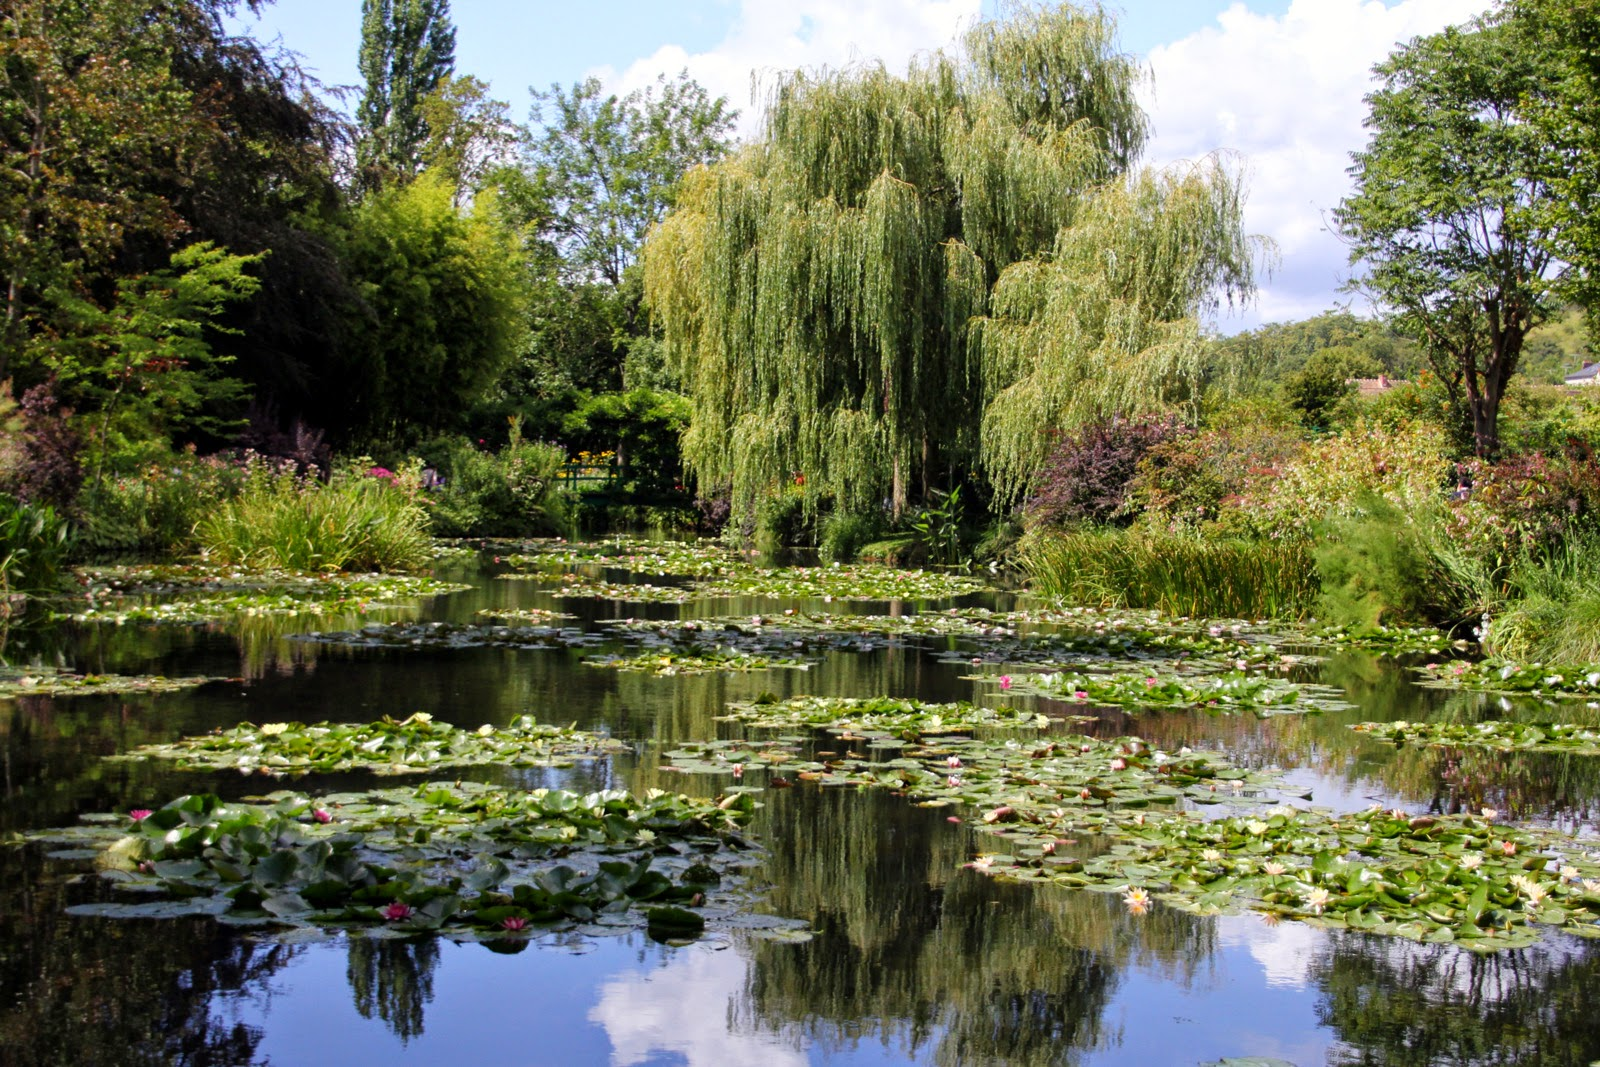 Jardins de Claude Monet - Nymphéas